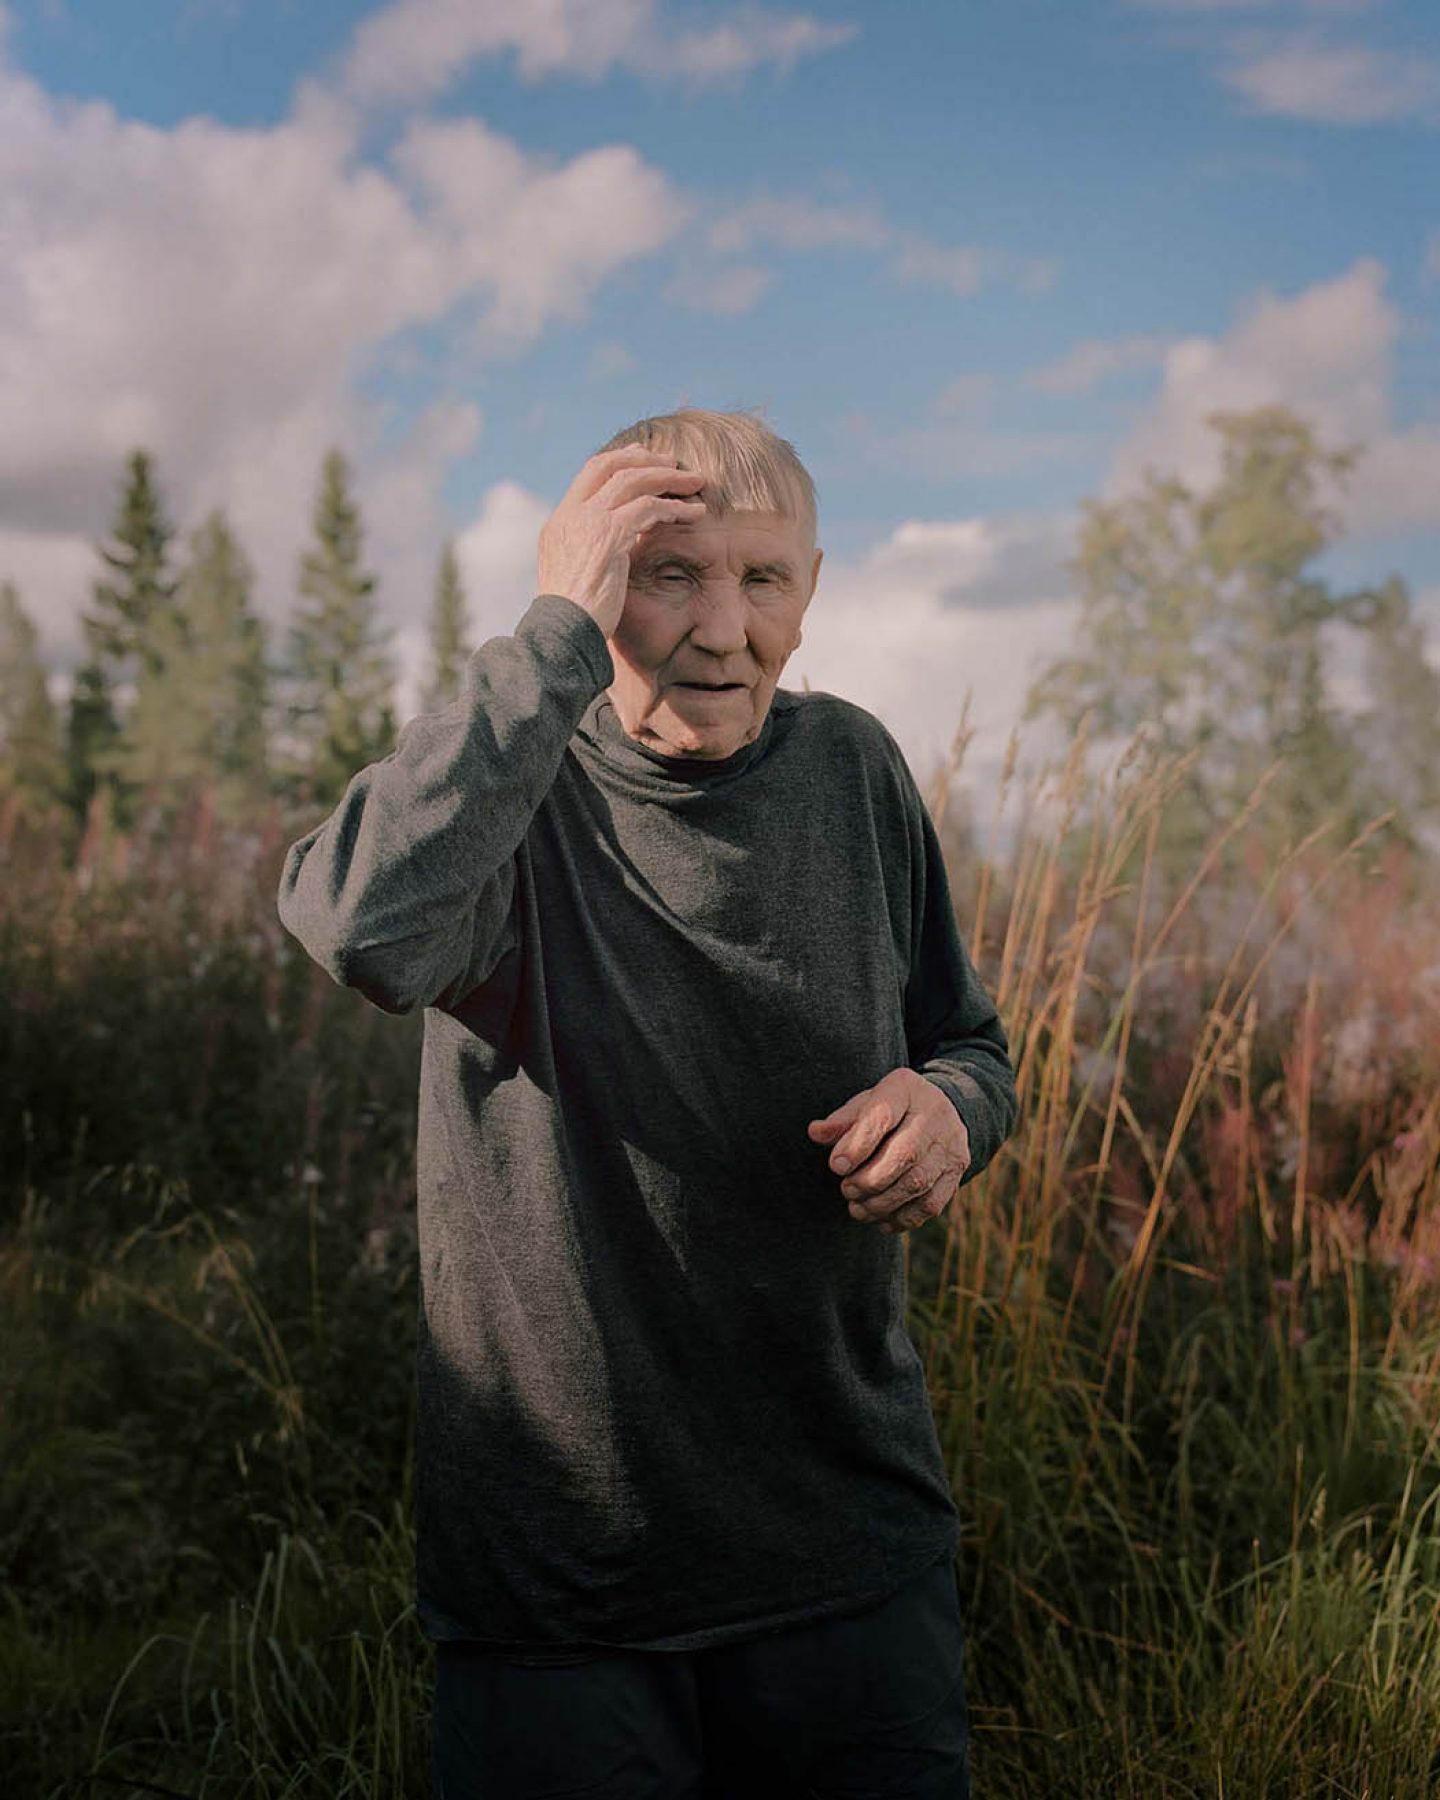 iGNANT_Photography_Aapo_Huhta_Ukkometso_Finland_1